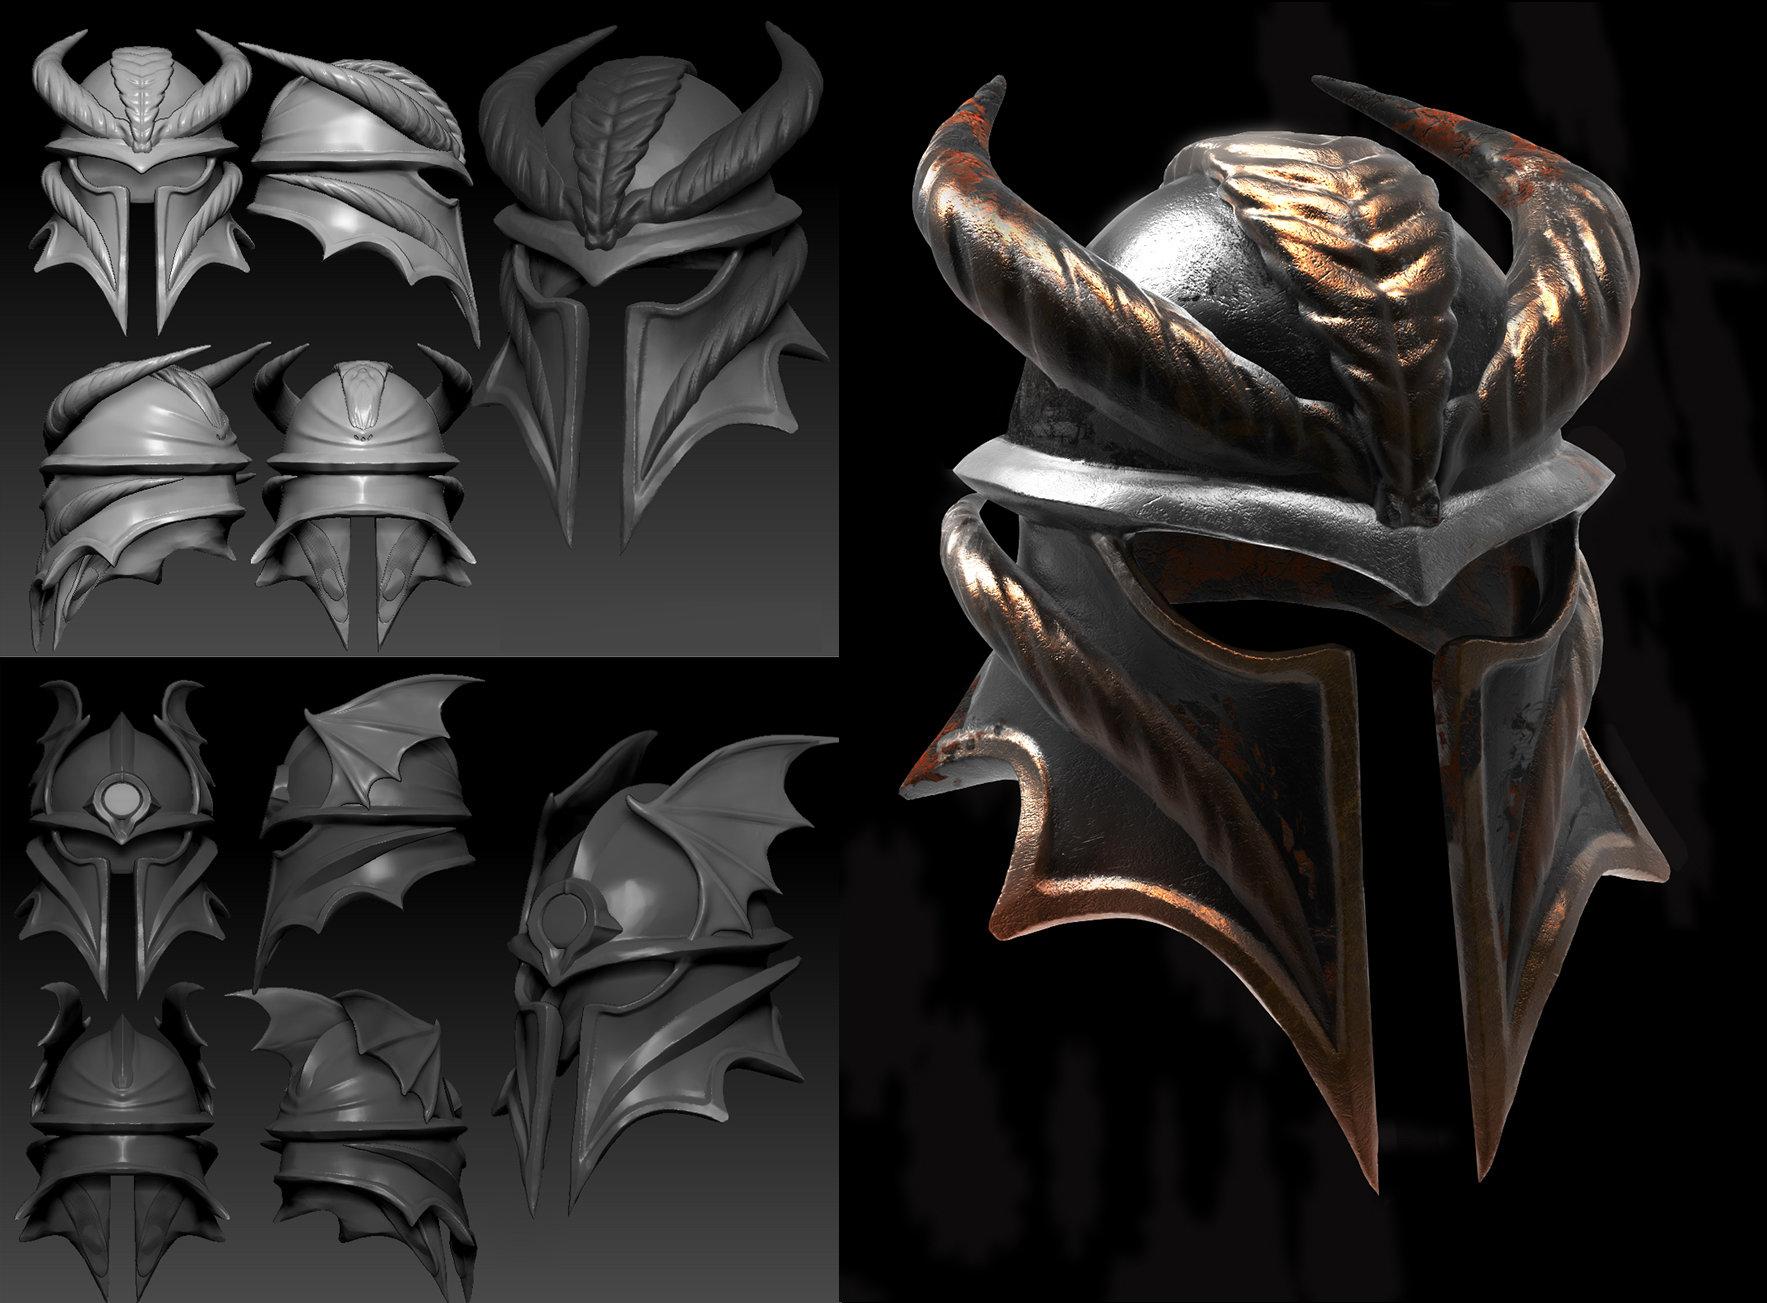 Cool Knight Helmets